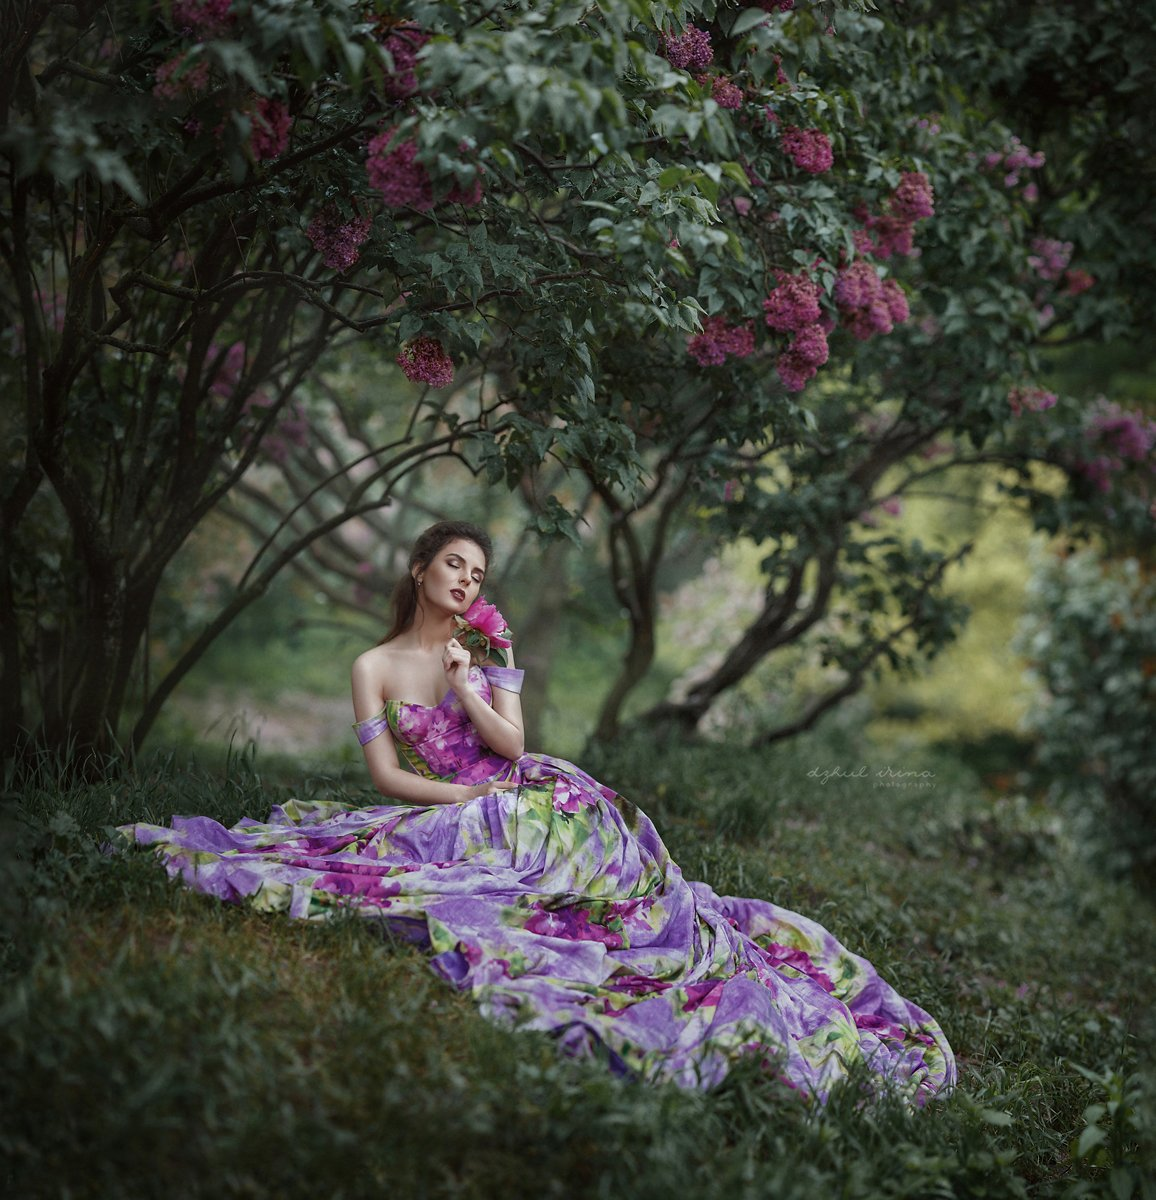 Dress, Flower, Girl, Green, Lilac, People, Popular, Portrait, Trees, Ирина Джуль